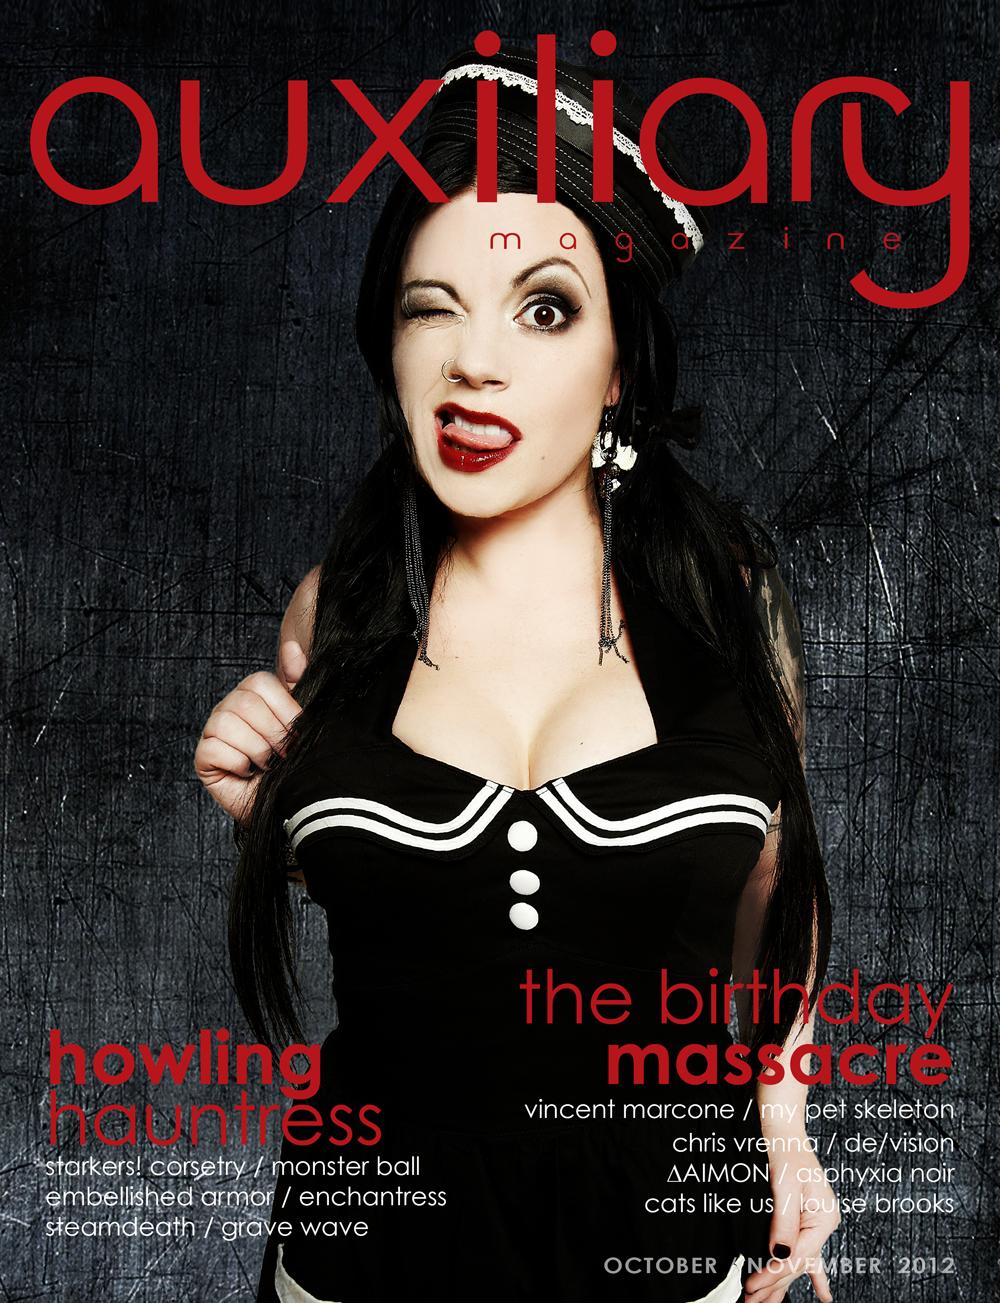 Auxiliary Magazine October/November 2012 cover